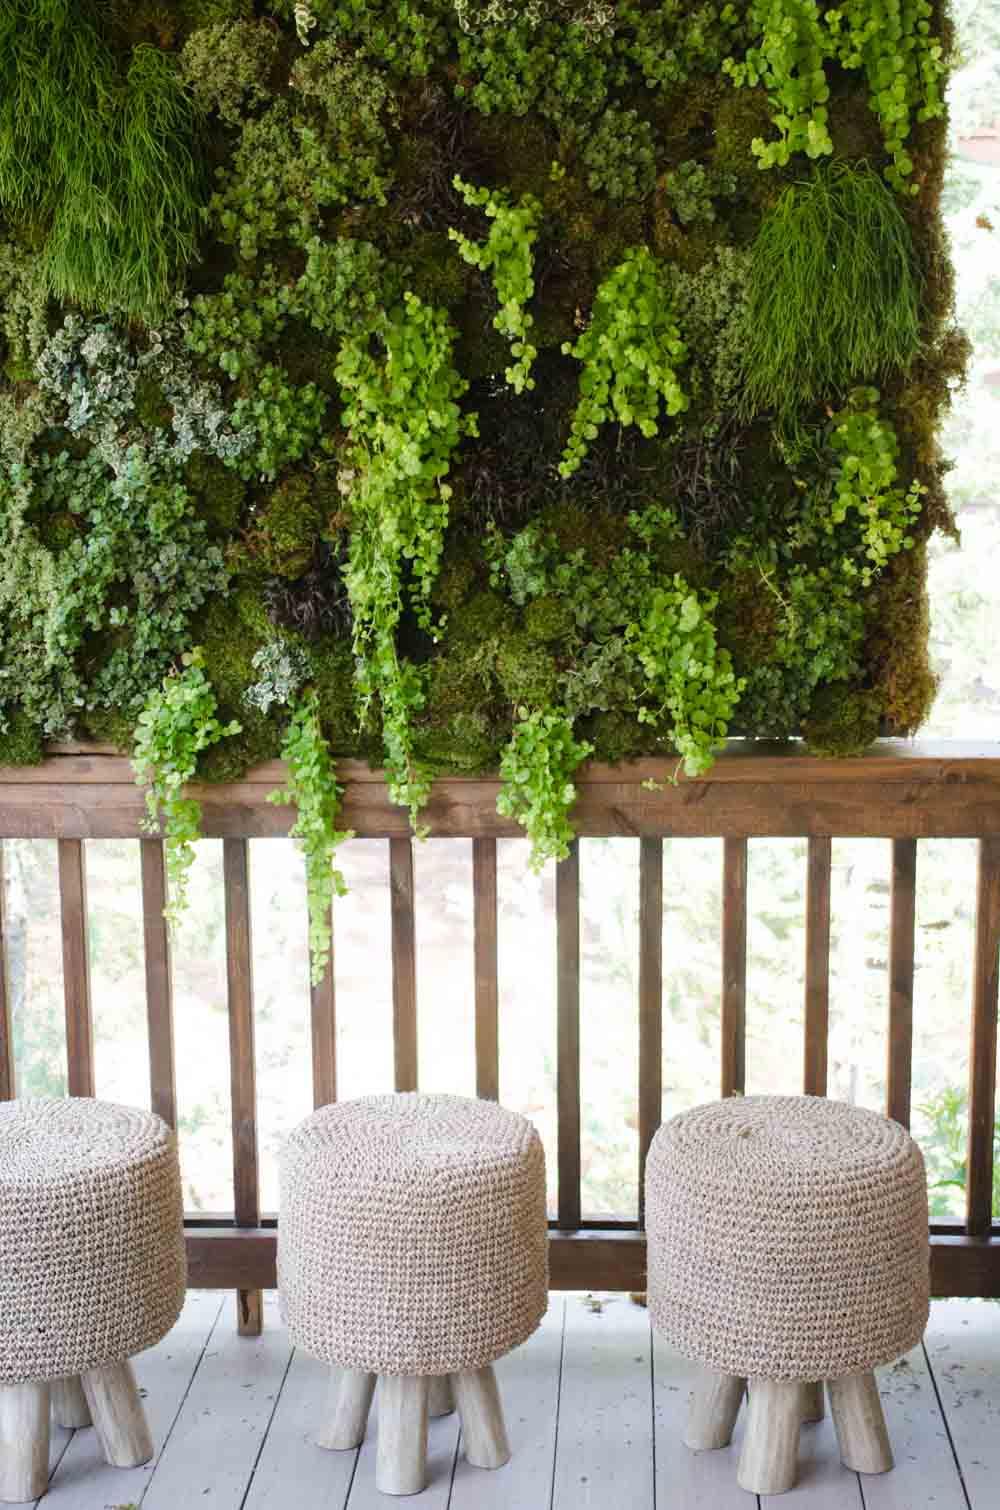 Hanging moss planter on porch